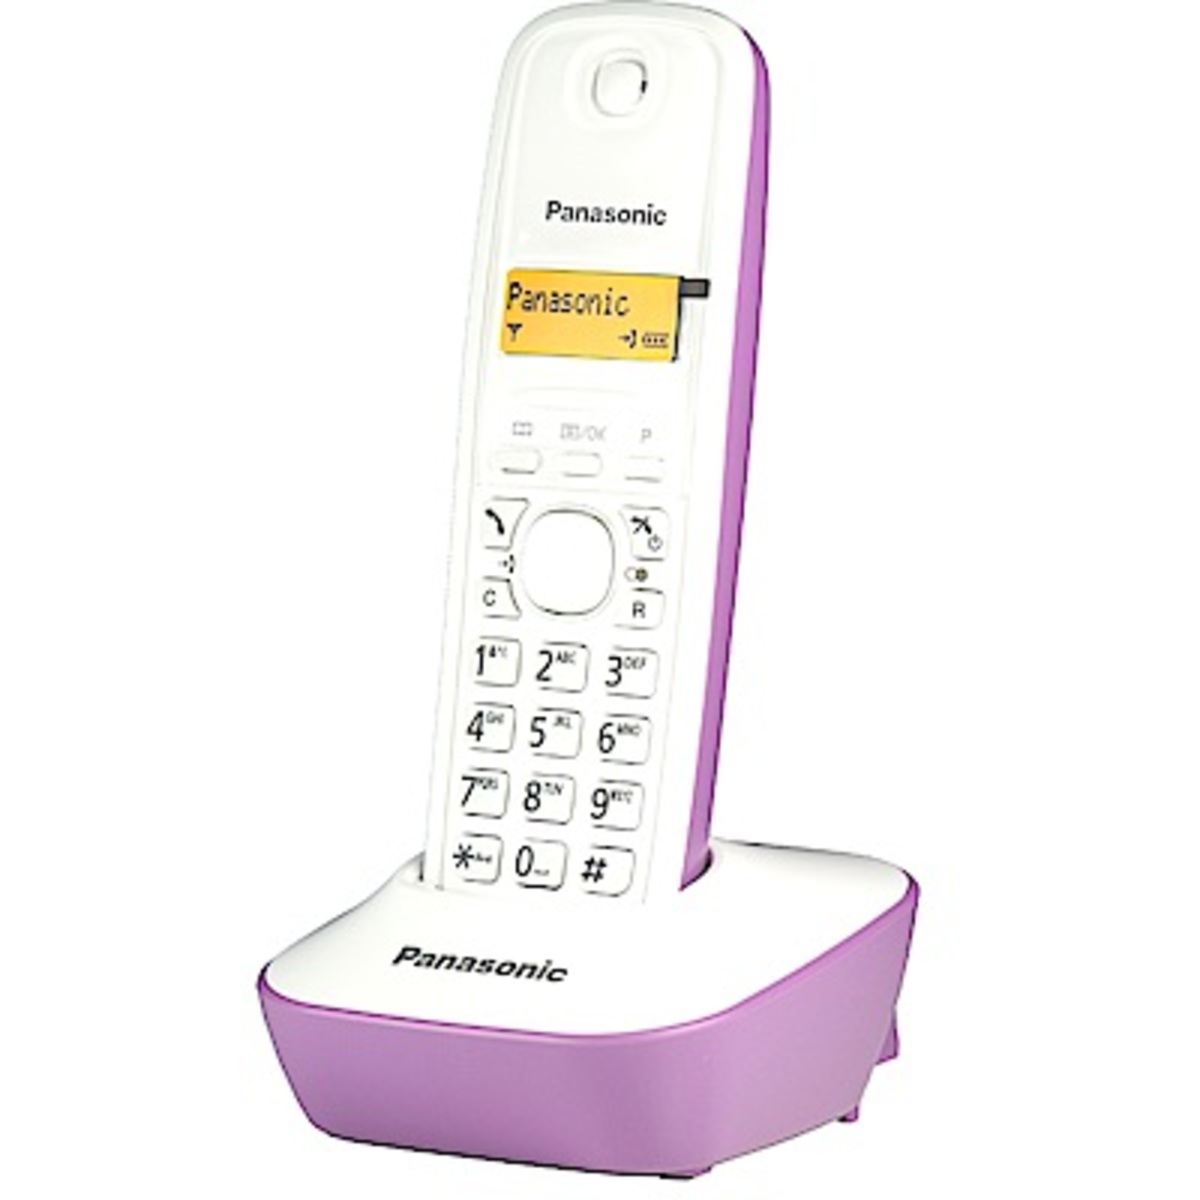 KX-TG1611HK Purple DECT Phone Purple Hong Kong Warranty Genuine Products